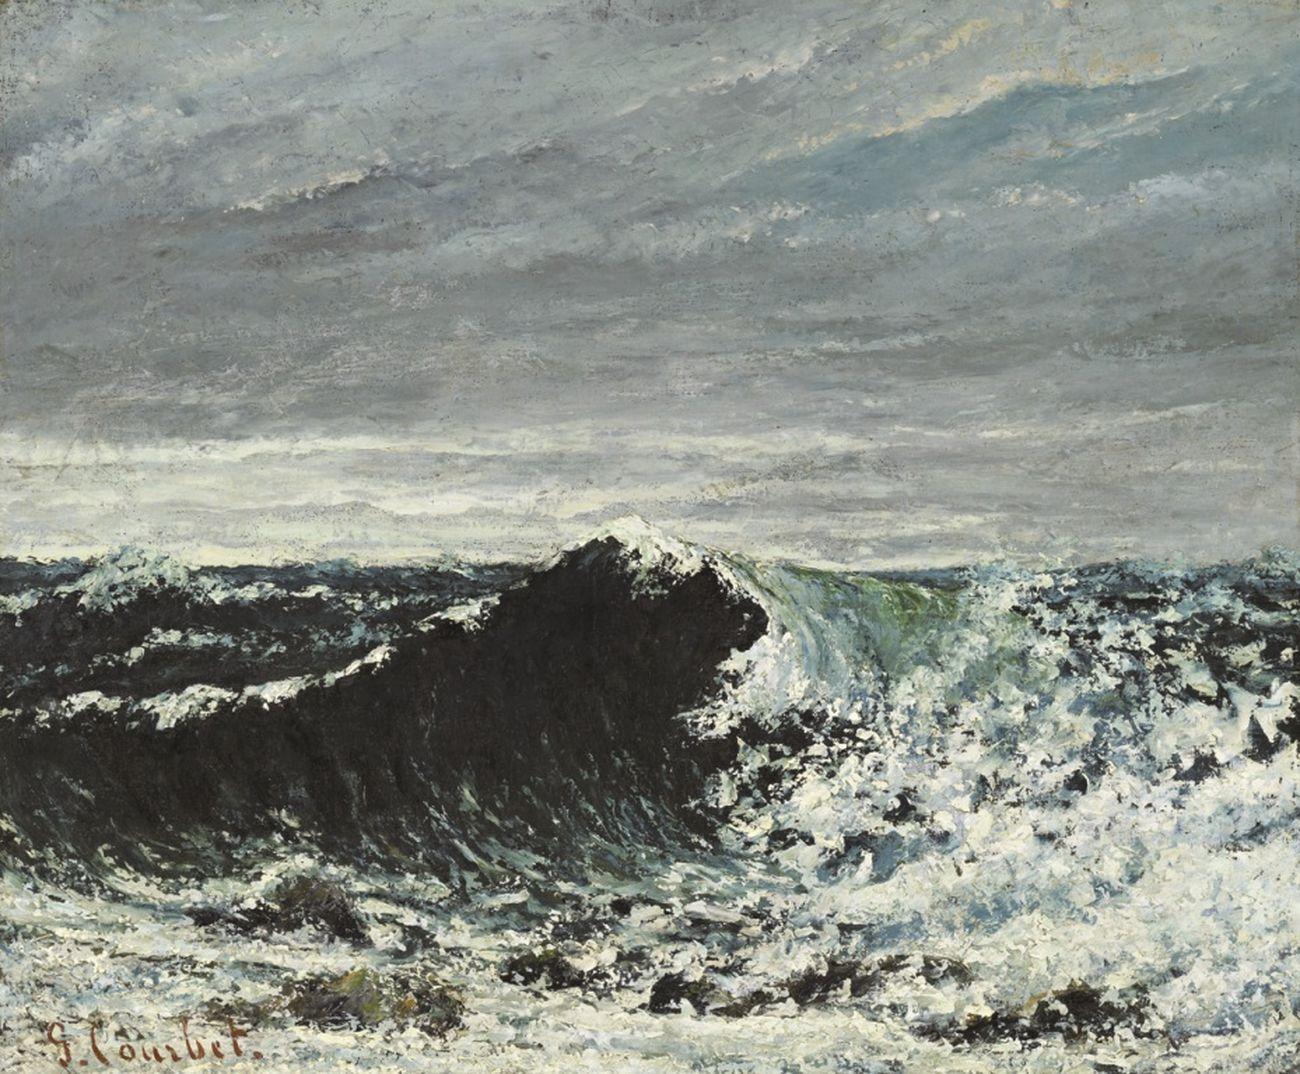 Gustave Courbet, L'onda, 1869 ca. Edimburgo, National Galleries of Scotland